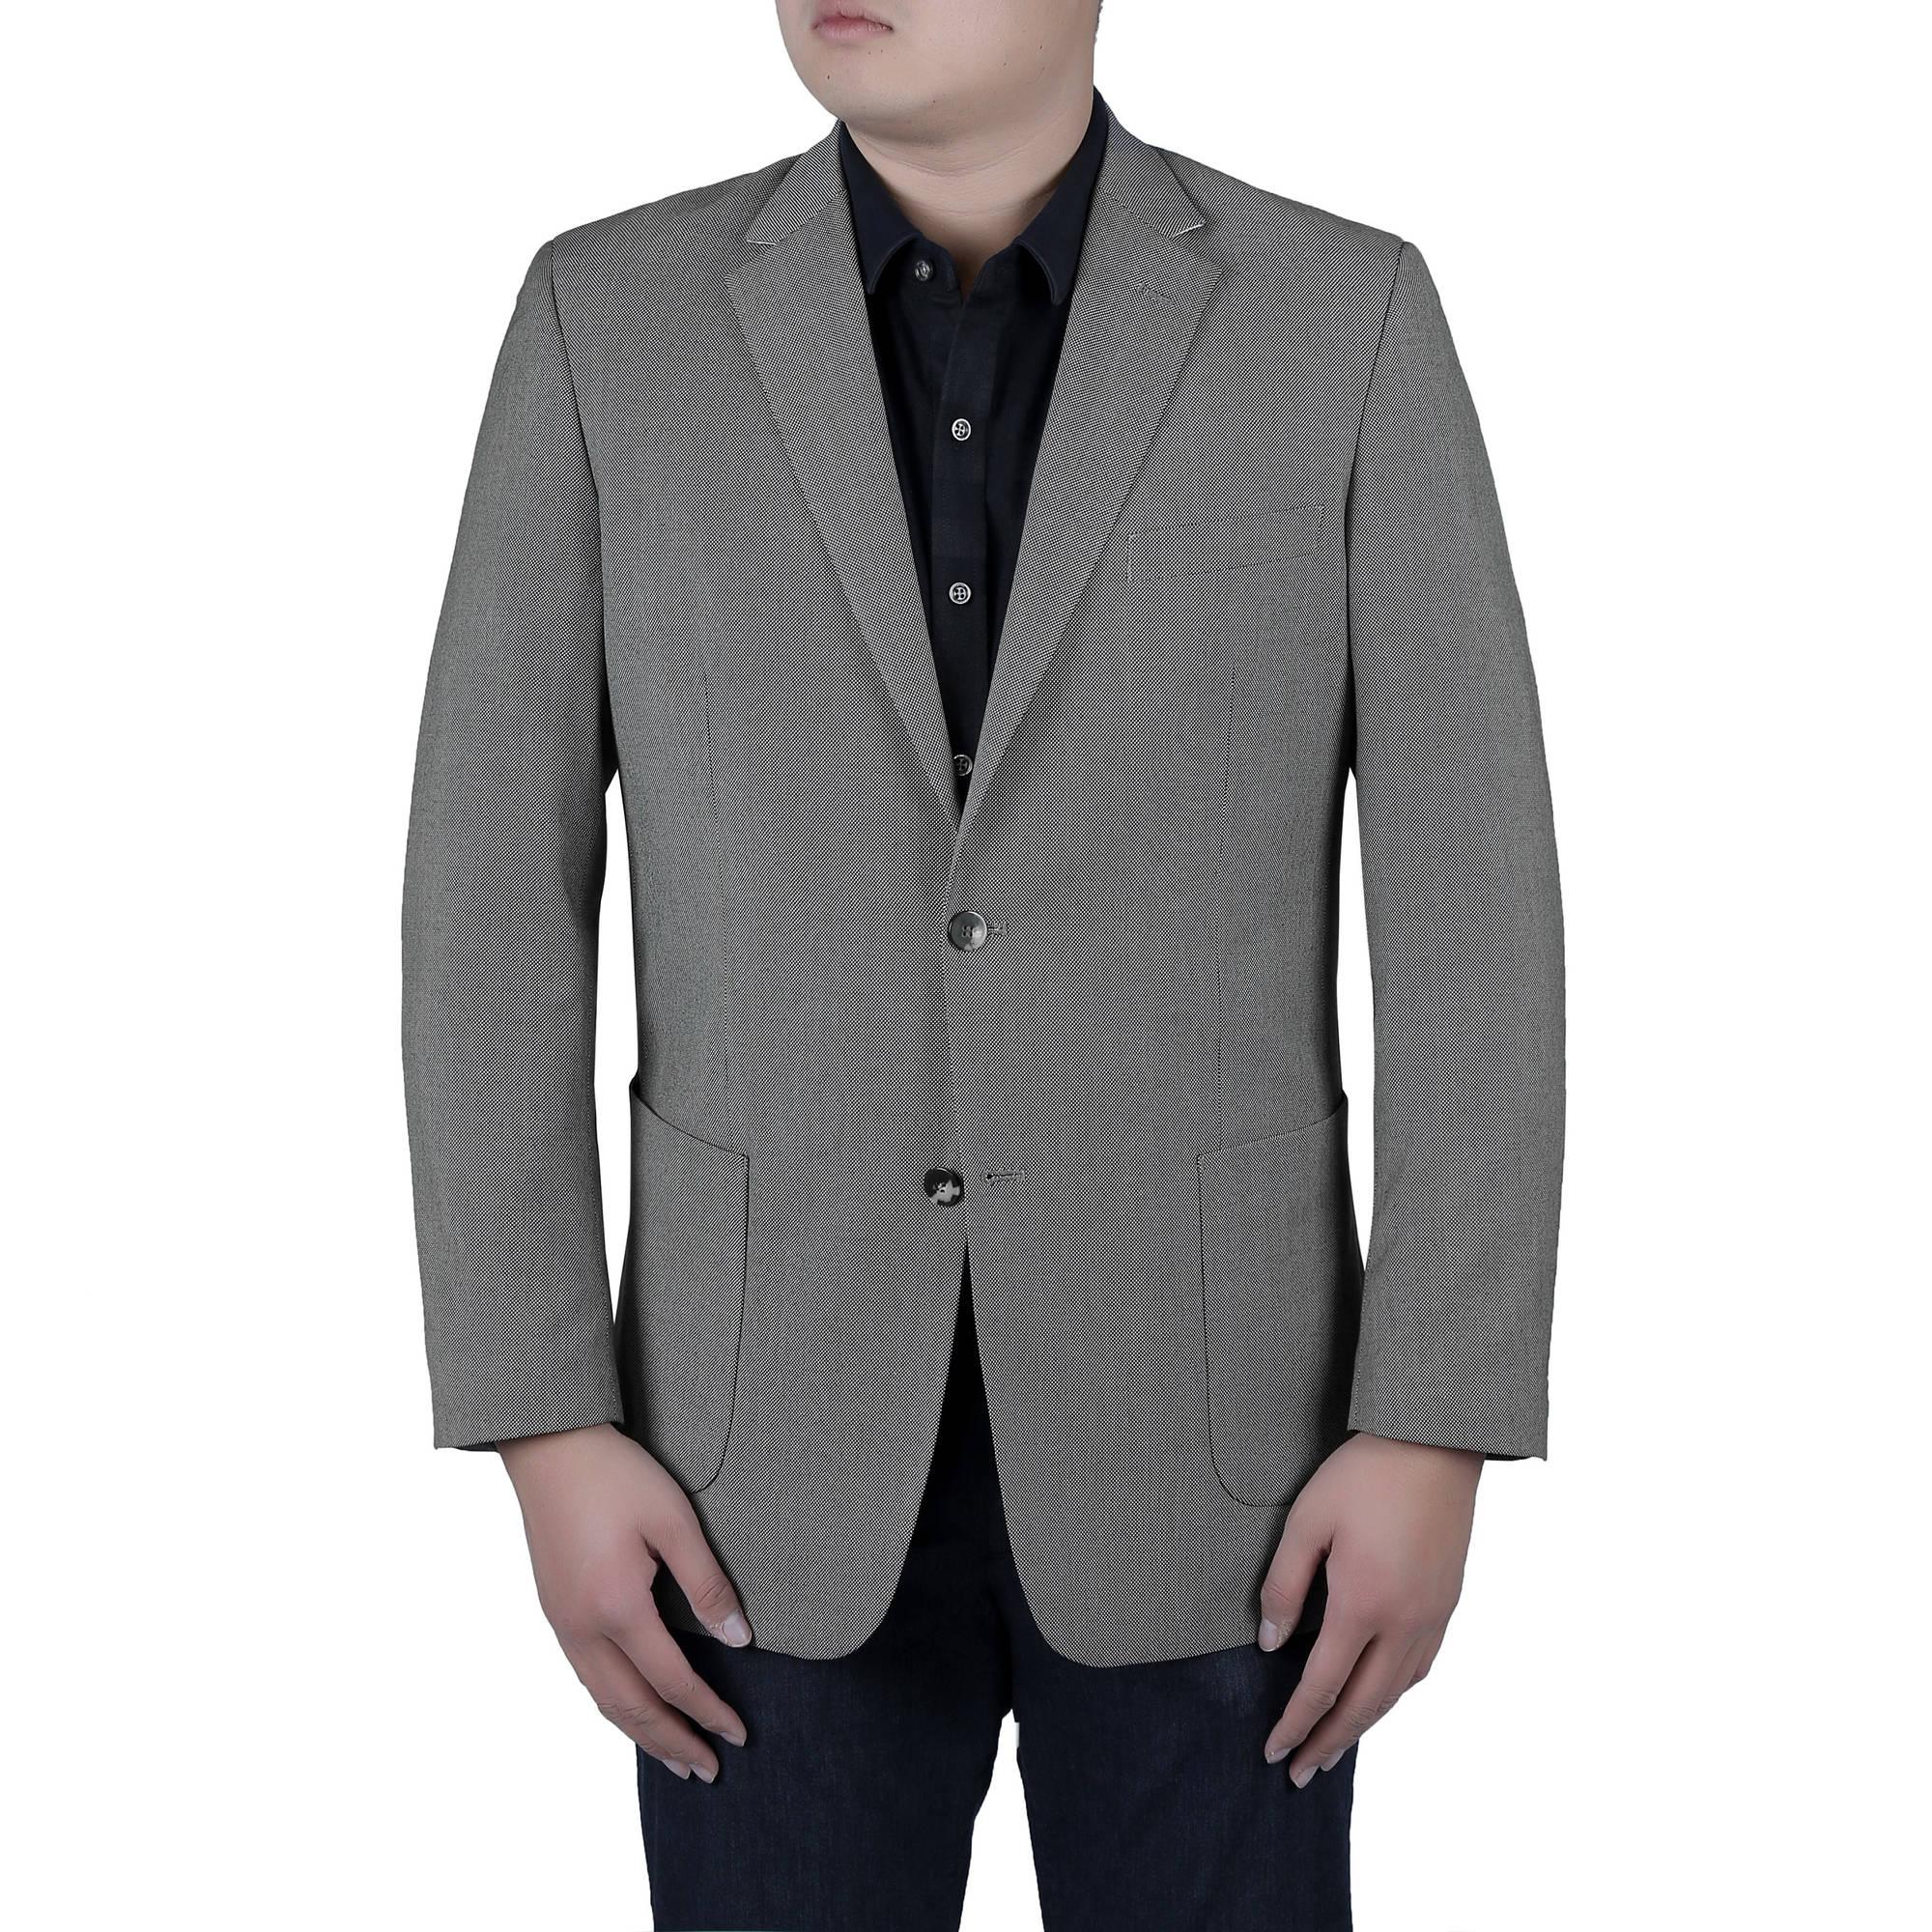 Verno Big Men's Grey and Black Birdseye Textured Classic Fit Italian Styled Blazer